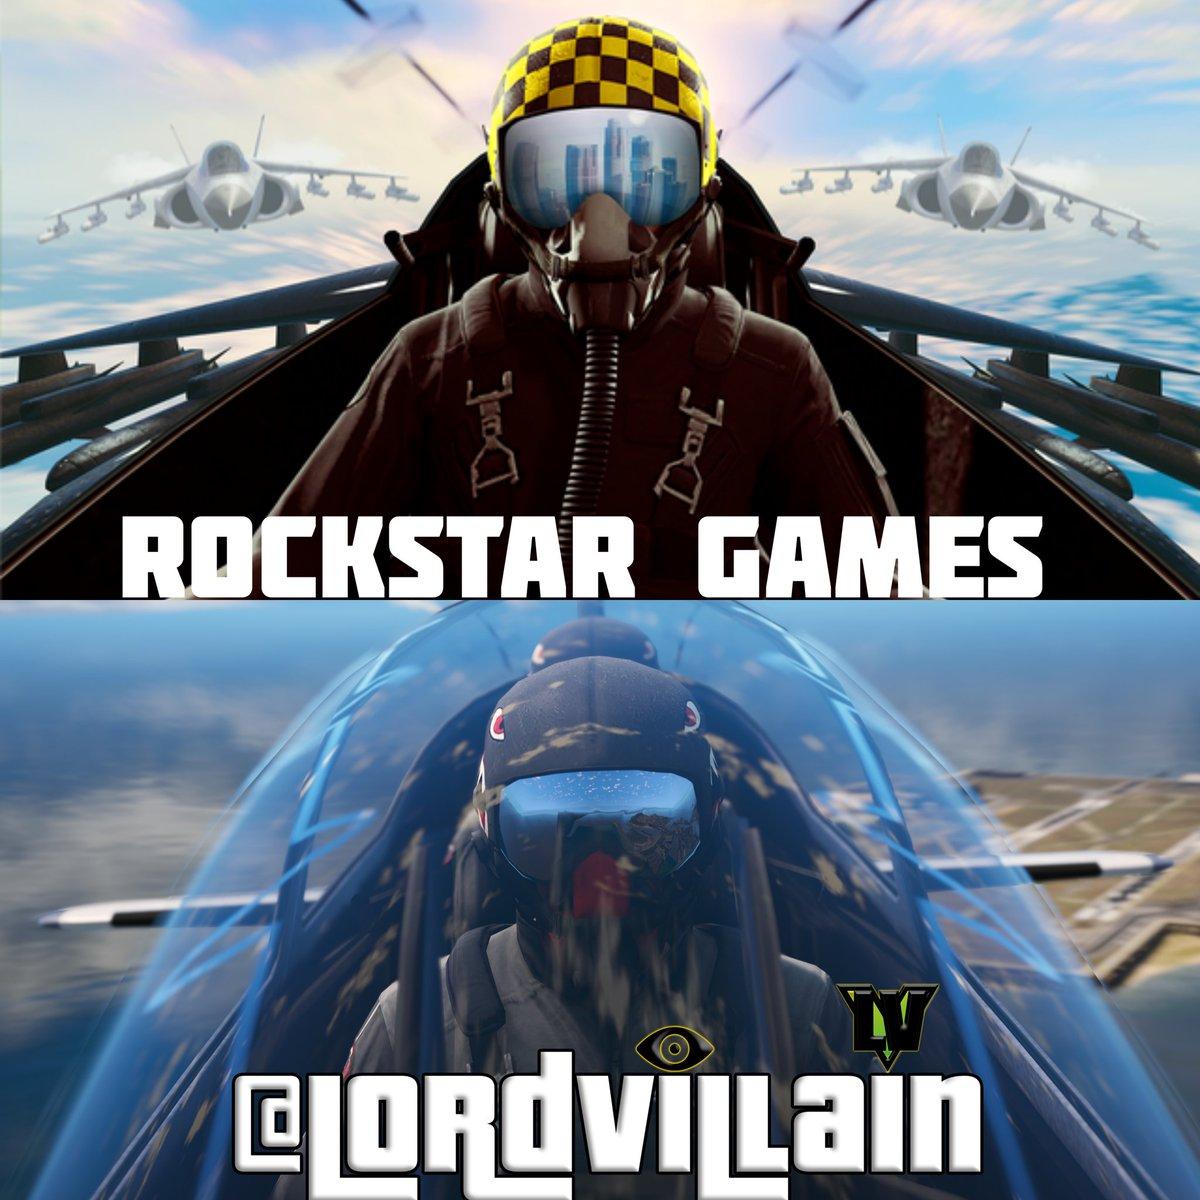 @RockstarGames VS LordVillain Bring it FAM!💯👌🏻😜 #PilotWeek #RockstarGames #GTAPhotographers #GTAOnline #GTAVPC #GTAV #GTA5 #GTA #PS5 #GTAVI #pilot #teamusa https://t.co/9nLs6Uj5qu